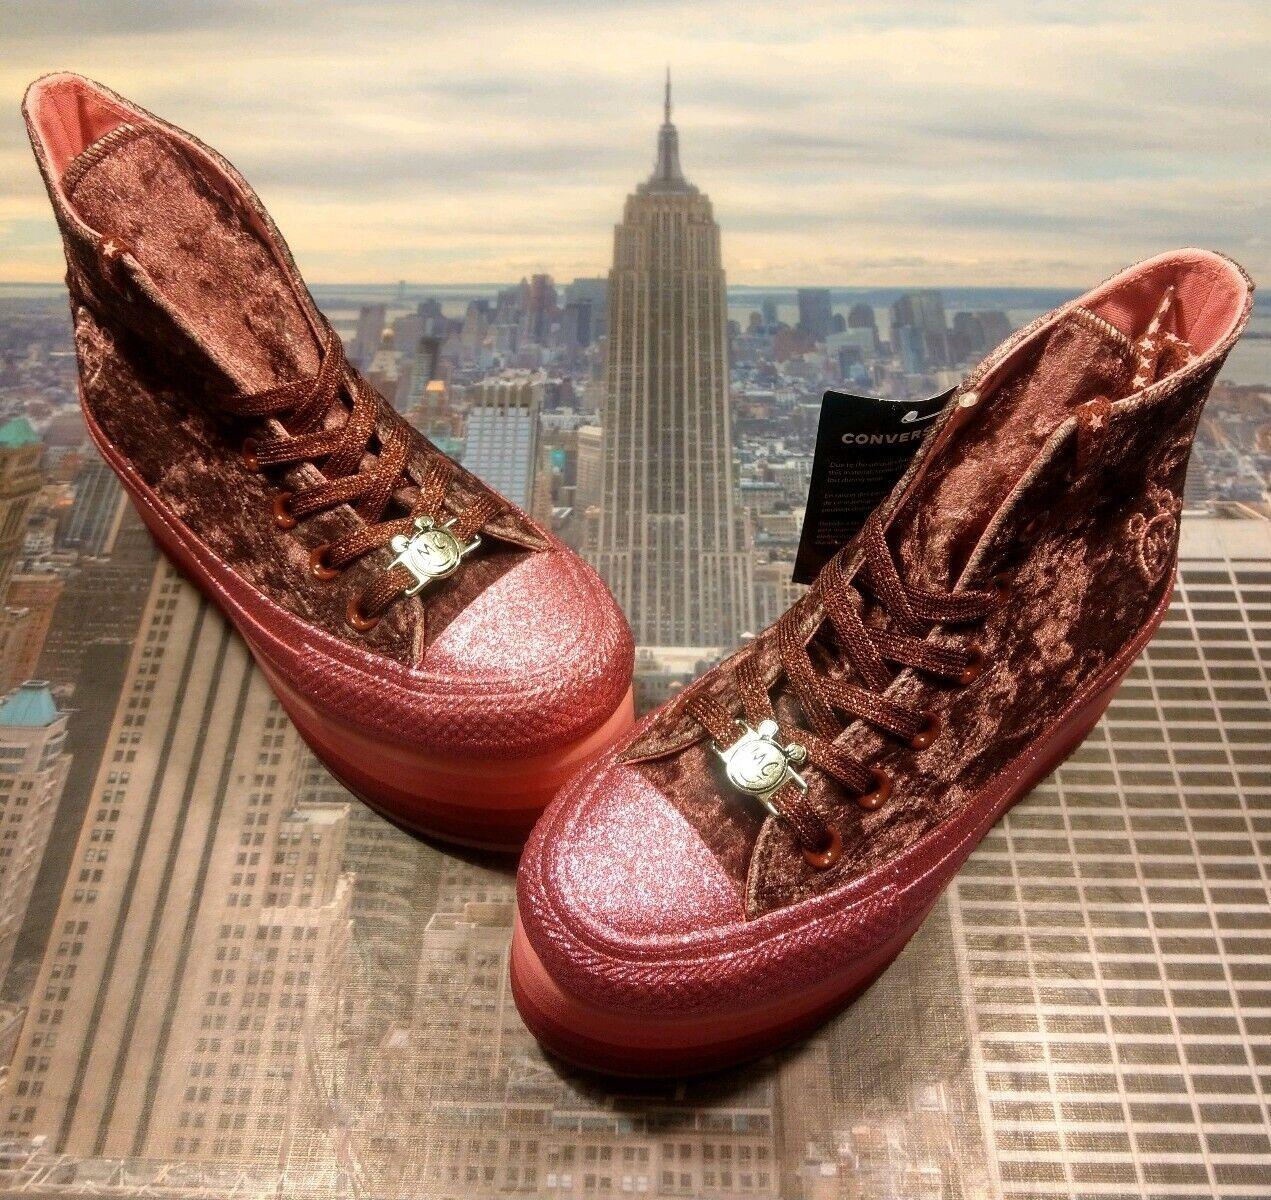 Converse x Miley Cyrus Chuck Taylor All Star Platform High Womens Size 5 563725c